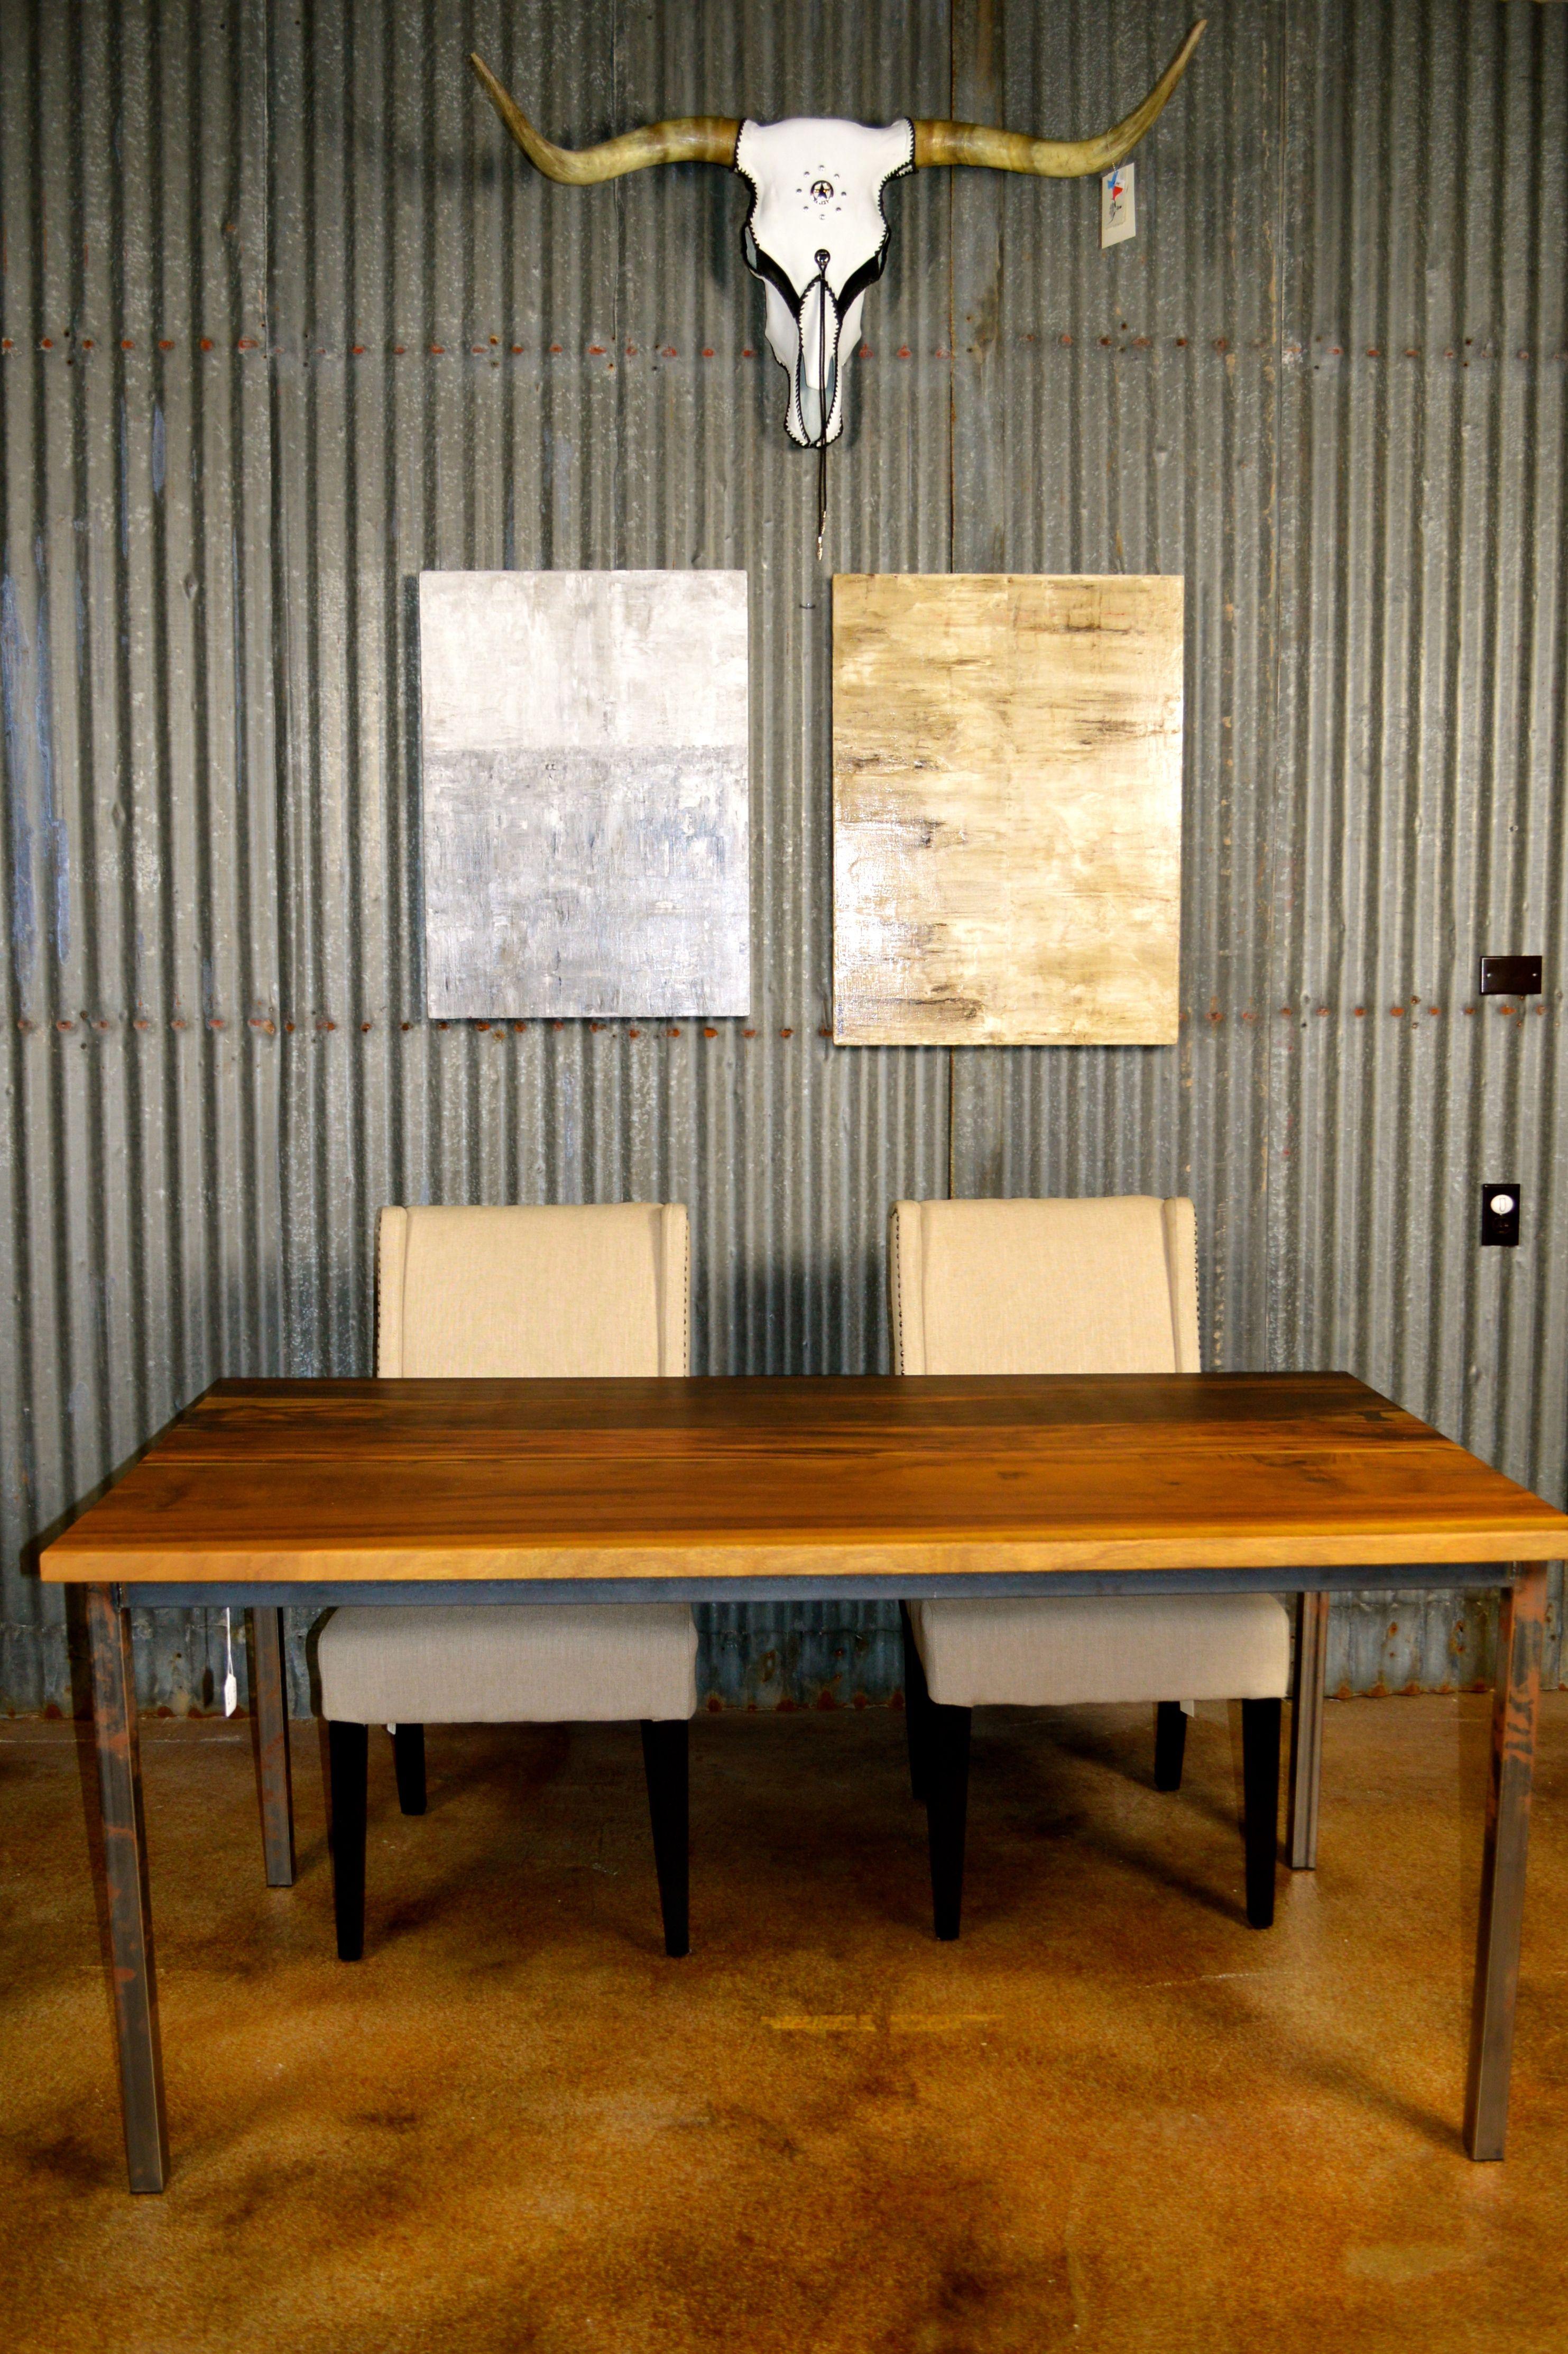 Custom Made Brazilian Imbuia Dining Table   Custom Made   Brazilian Imbuia    Raw Steele Welded. Handmade FurnitureAustin TxDining Tables